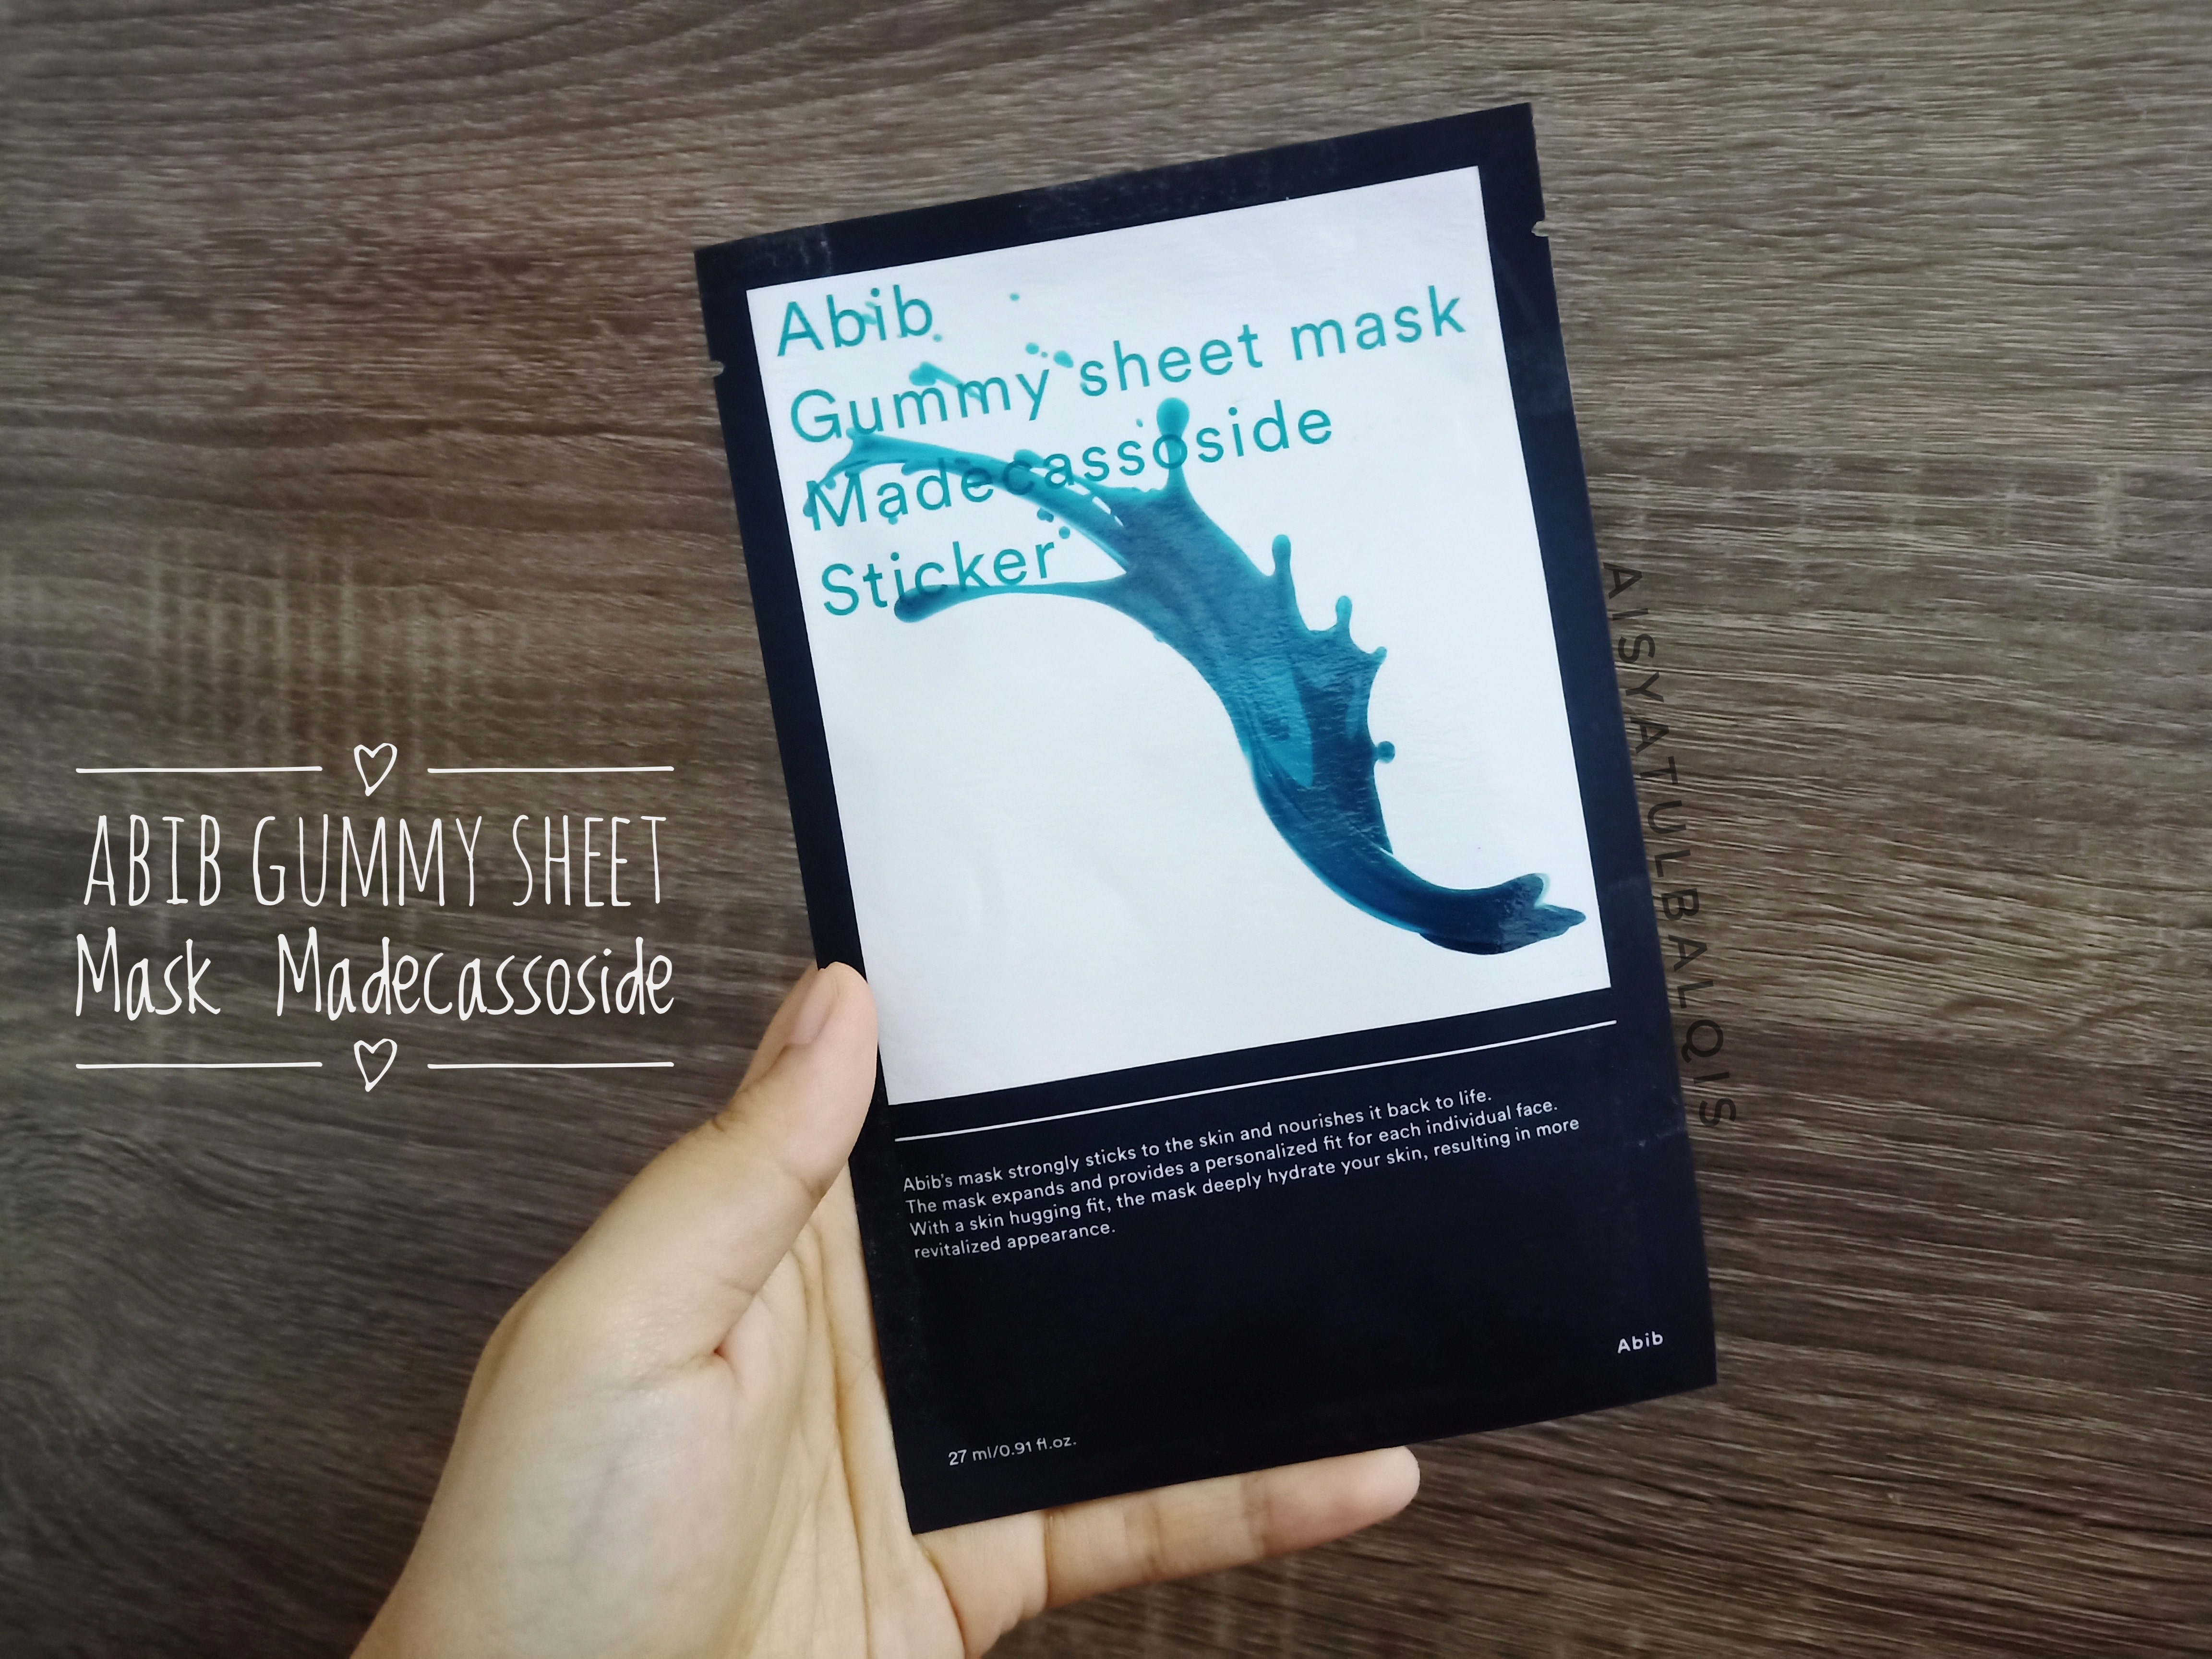 REVIEW | Abib Gummy Sheet Mask #Madecassoside Sticker